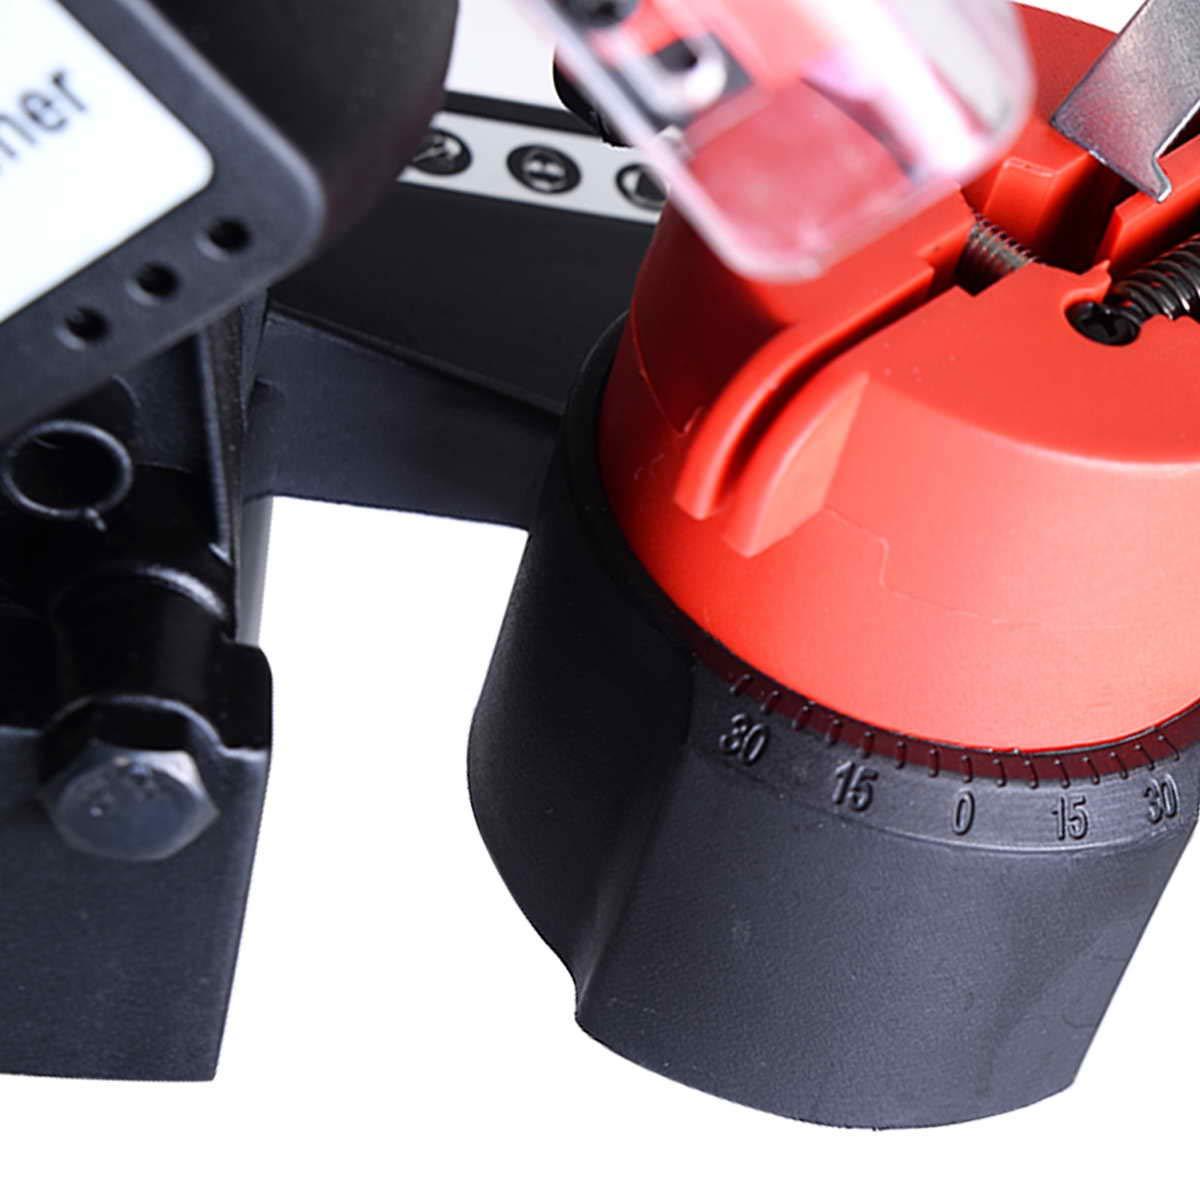 Safeplus Portable Electric Sharpener Chainsaw Chain Blade Grinder 7500 RPM for Oregon Husqvarna Stihl Echo HD New by Safeplus (Image #8)